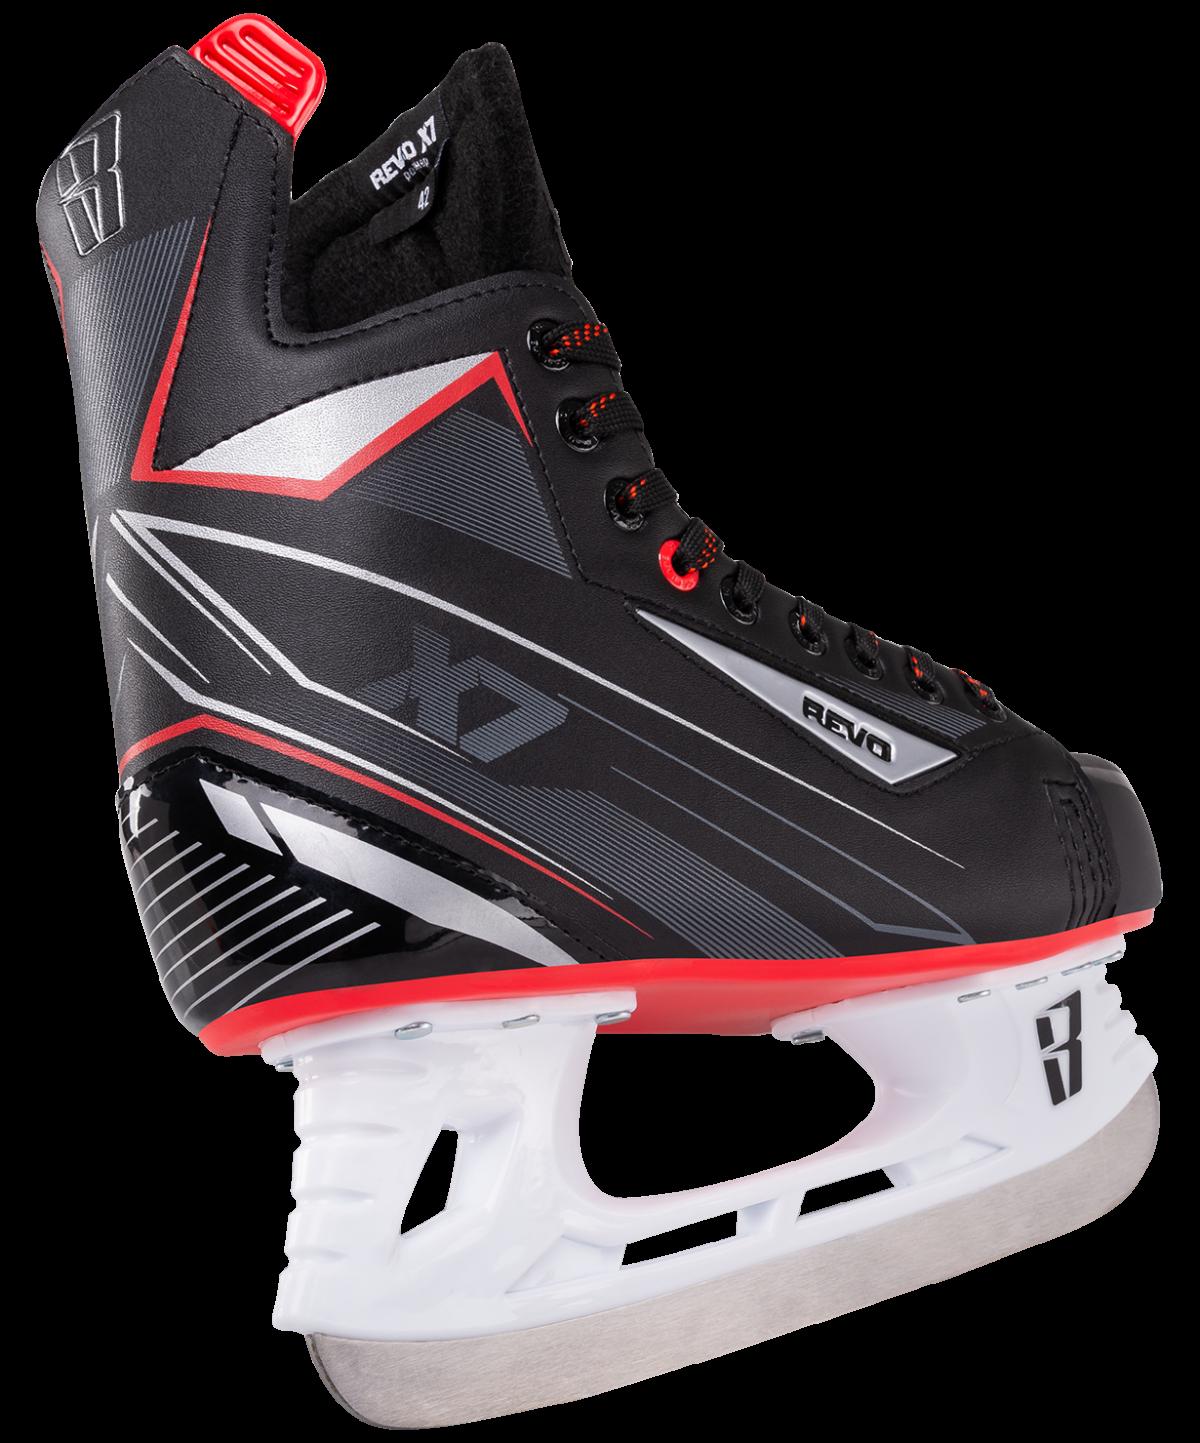 ICE BLADE Коньки хоккейные Revo Х7.0 - 6